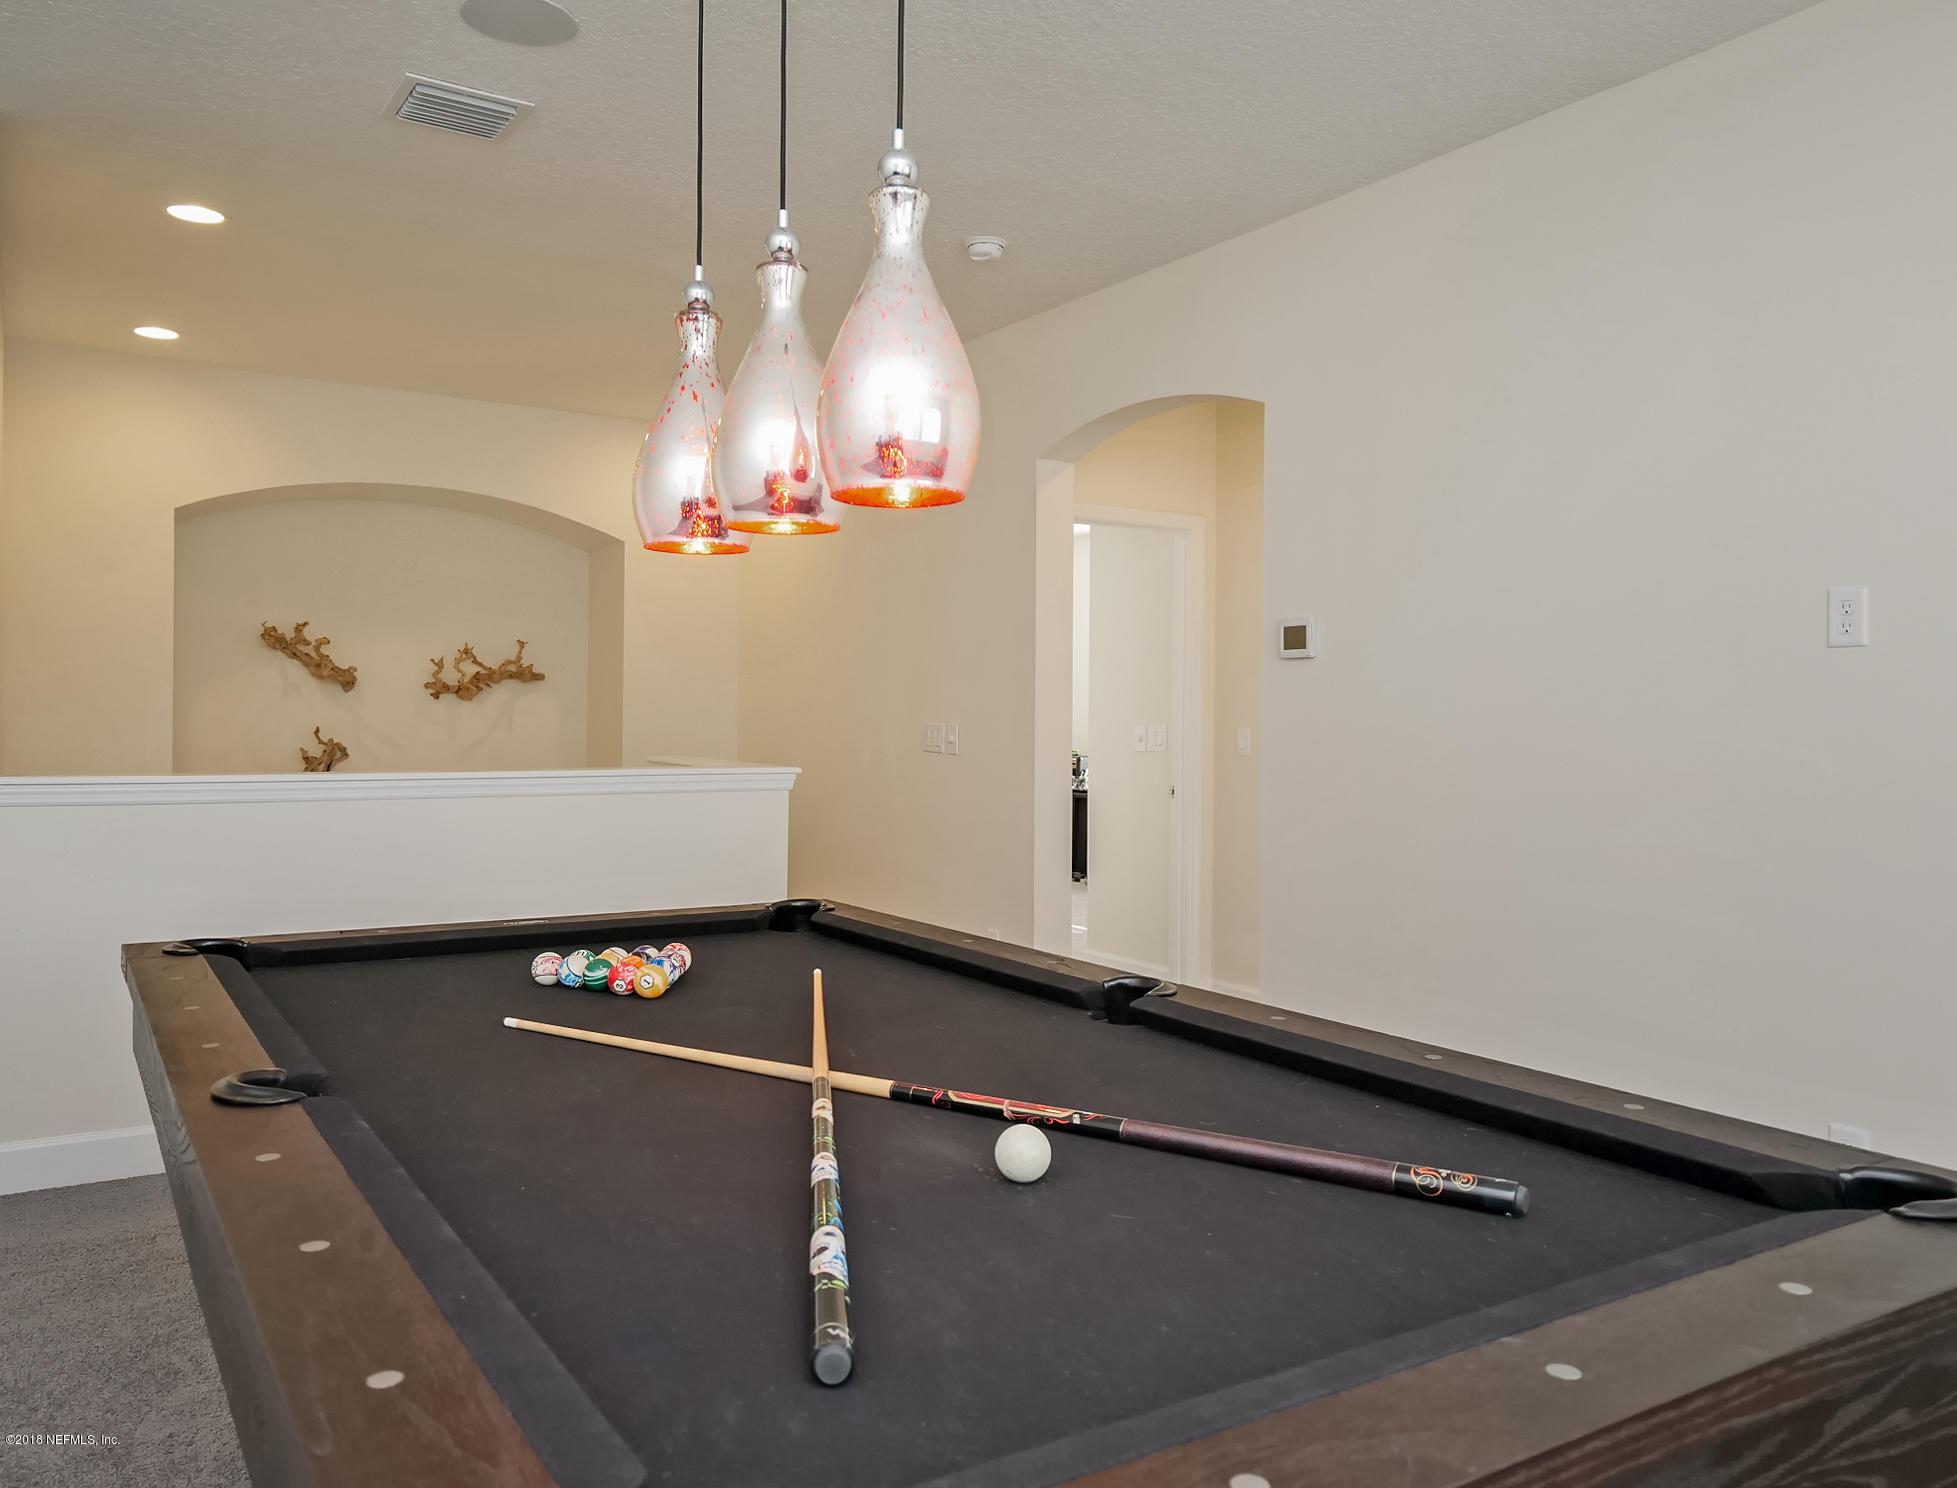 157 GALLEON, PONTE VEDRA, FLORIDA 32081, 4 Bedrooms Bedrooms, ,4 BathroomsBathrooms,Residential - single family,For sale,GALLEON,965479